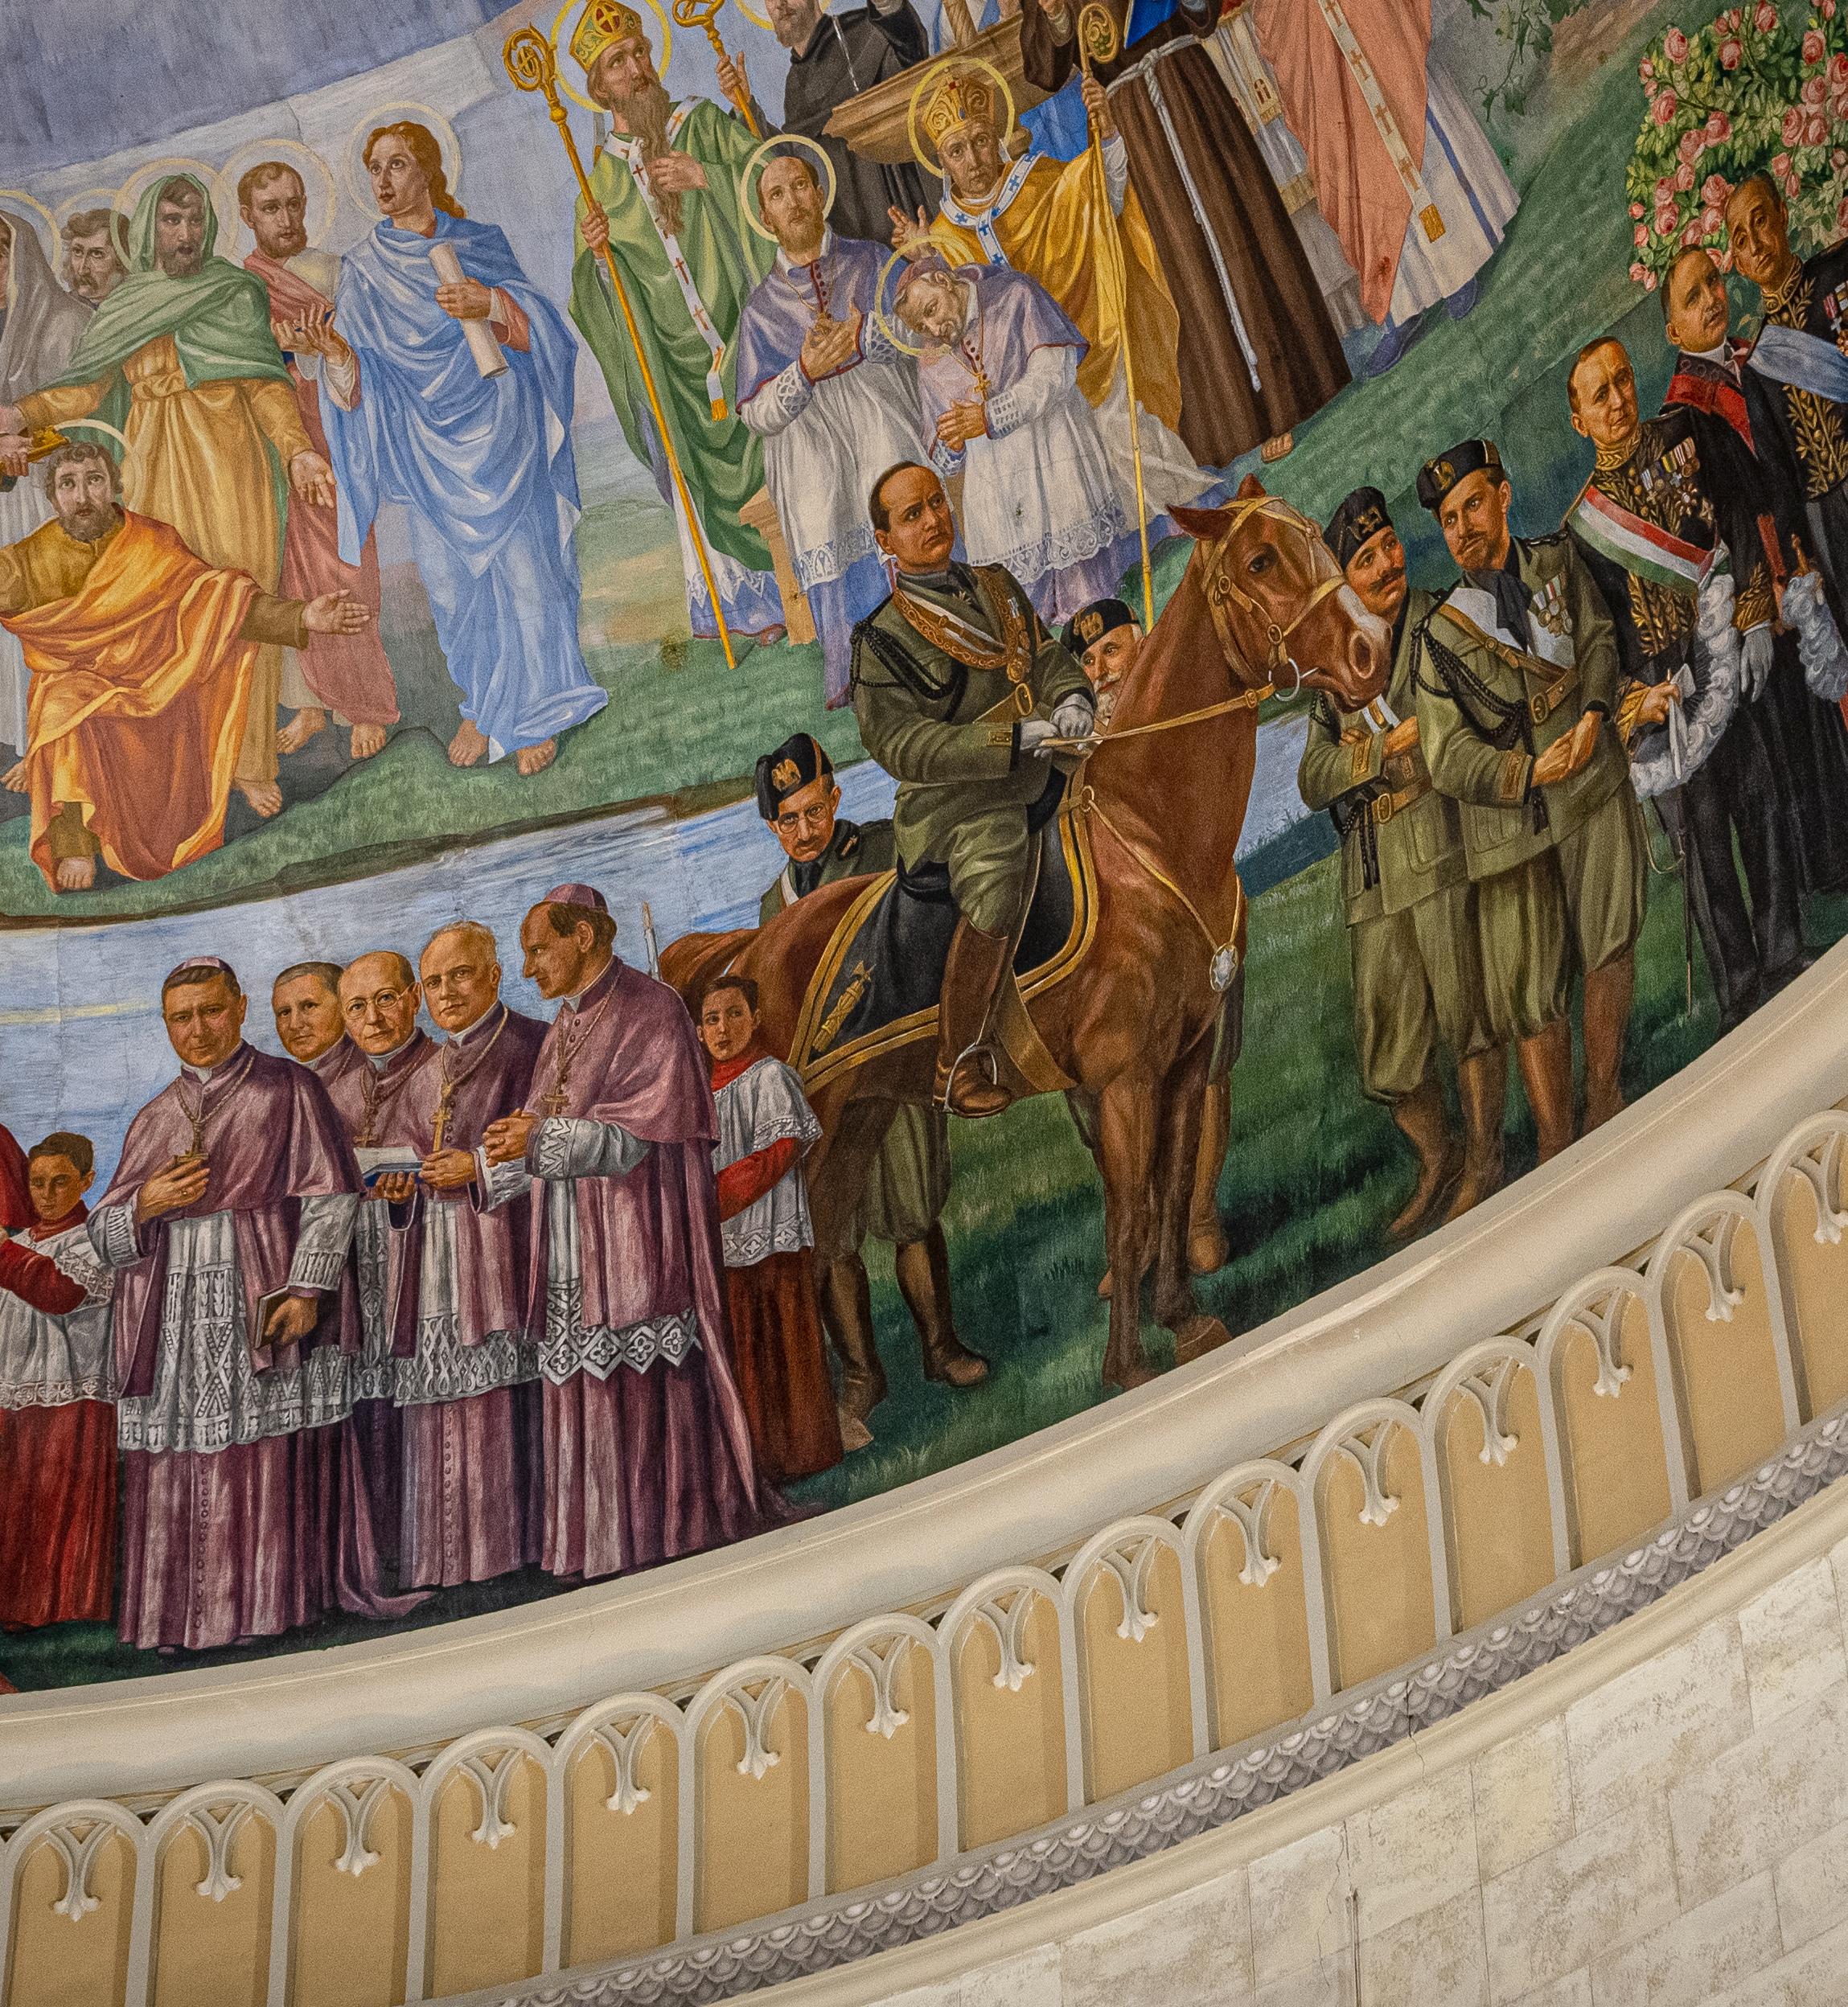 The fresco of former Italian dictator Benito Mussolini, on horseback, by artist Guido Nincheri in Montreal's Église Notre-Dame-de-la-Défense. (Jean-Francois Benoit/CBC)